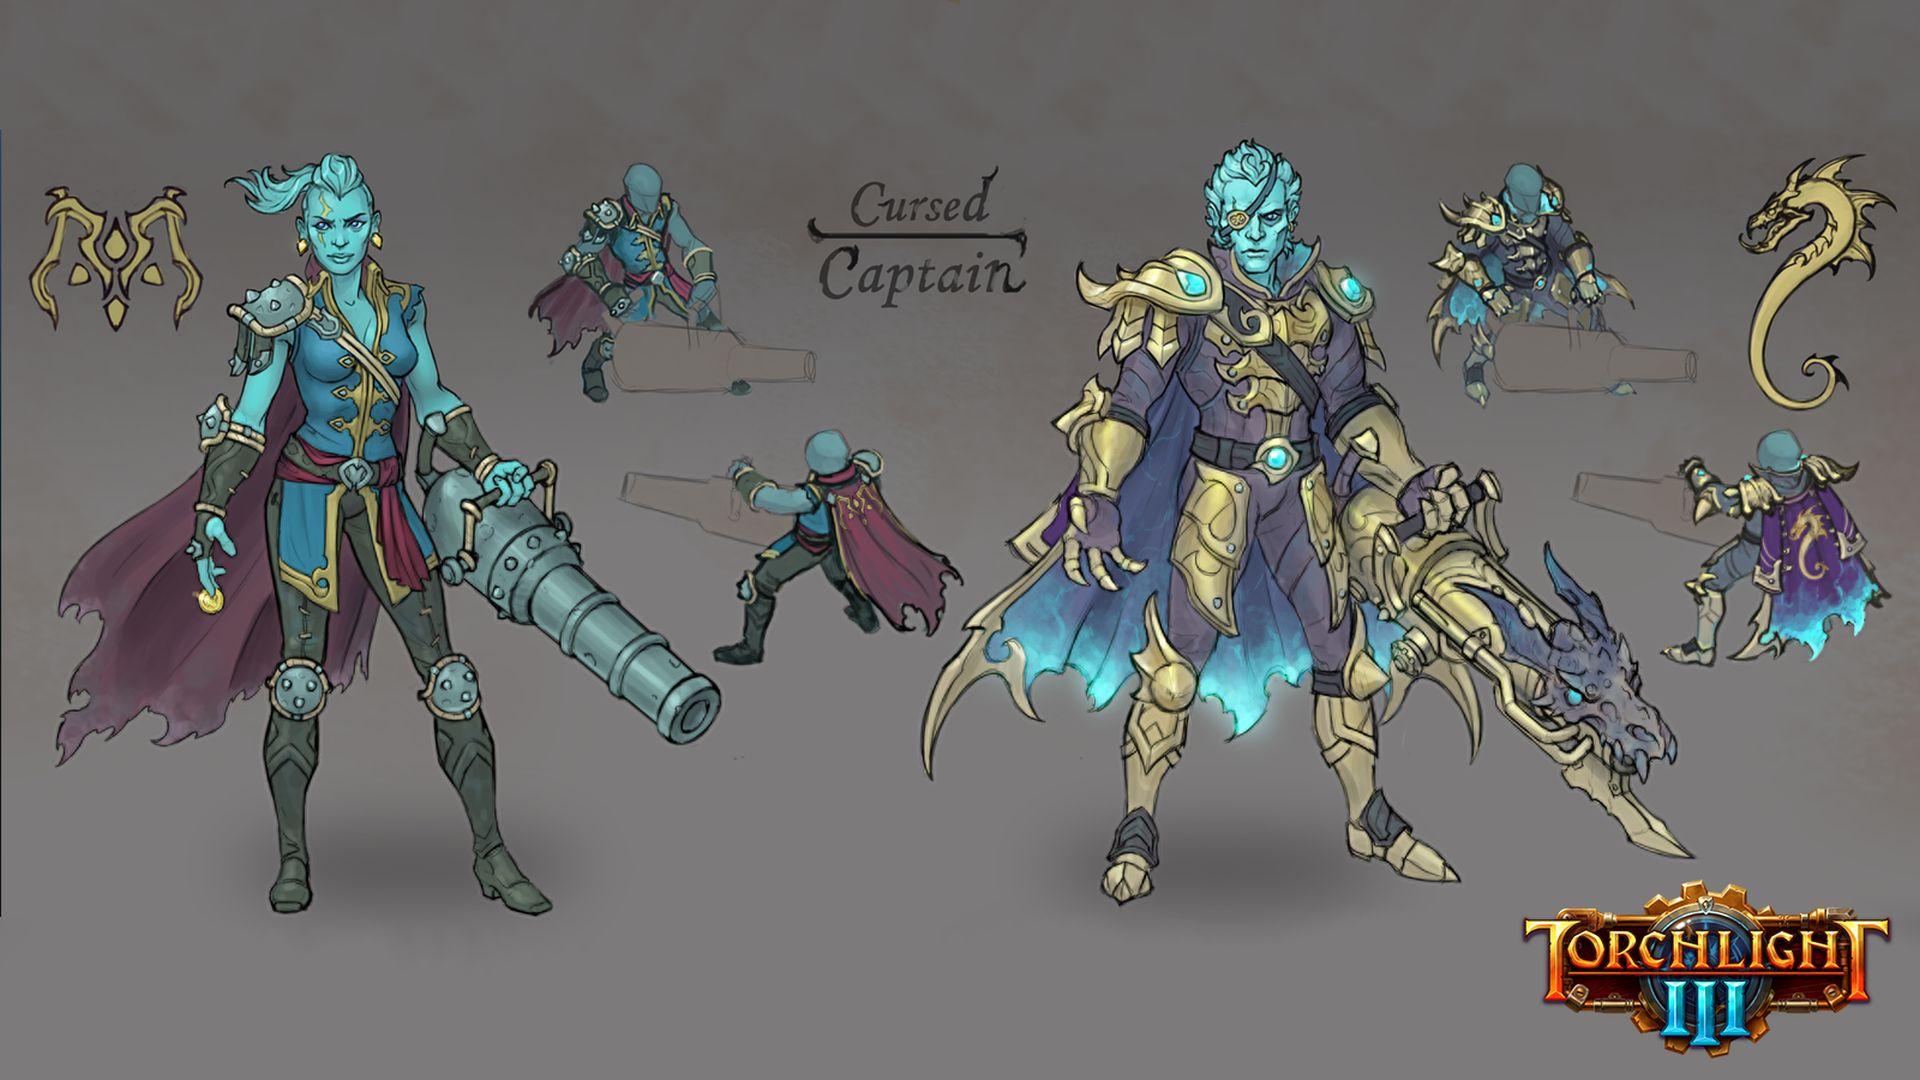 Torchlight 3 - Cursed Captain